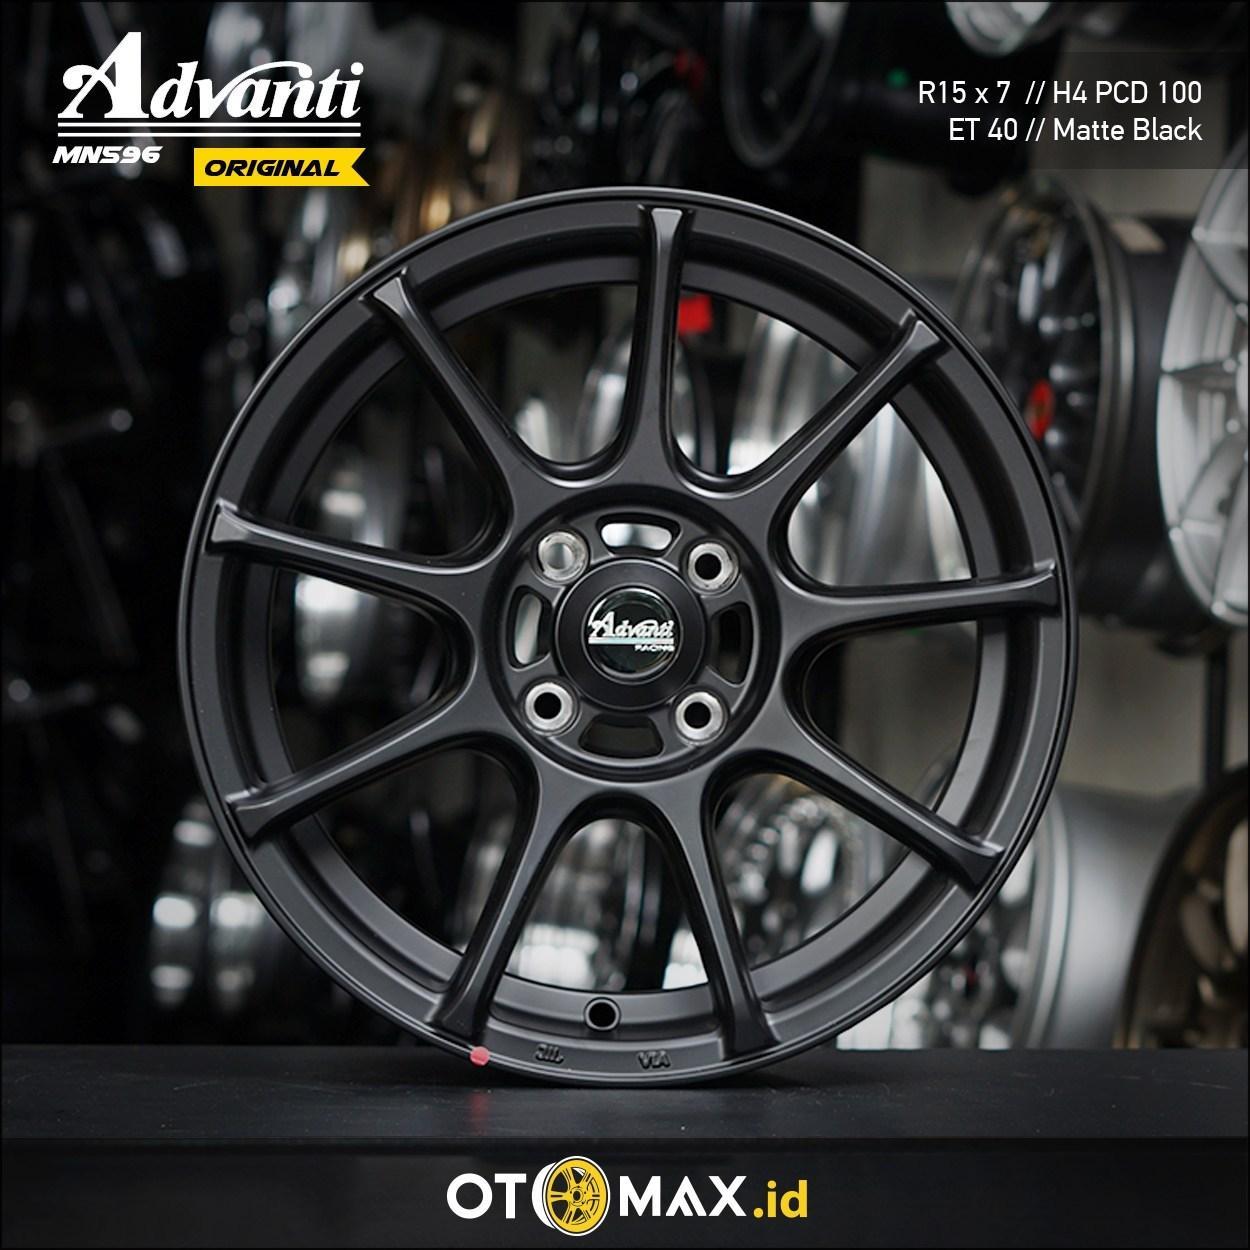 Velg Mobil Advanti MN596 ORIGINAL Ring 15 Matte Black